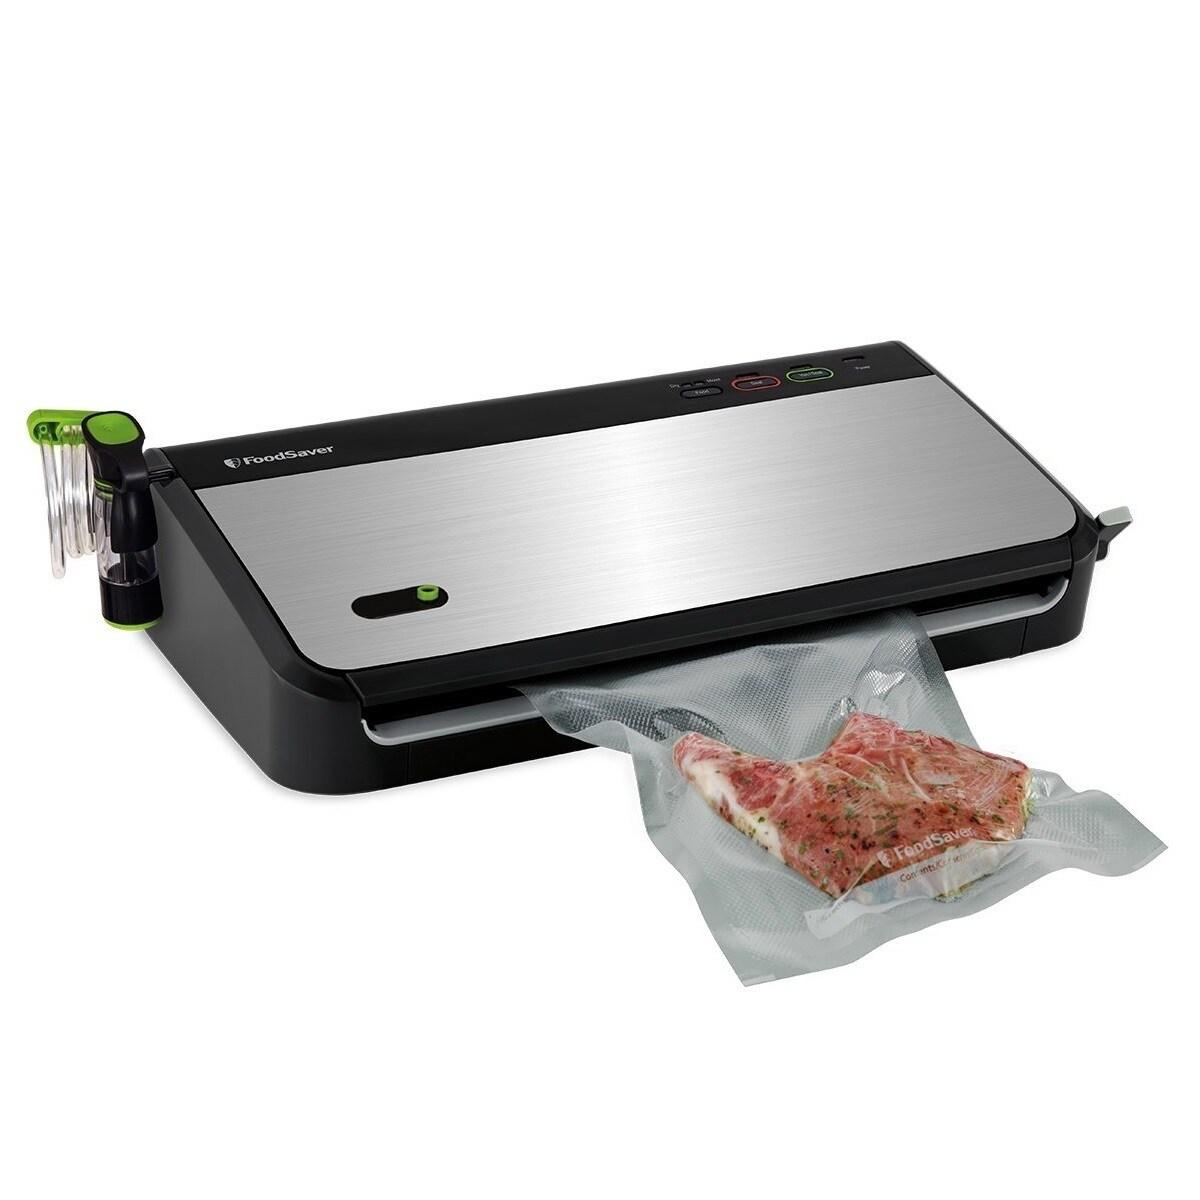 FoodSaver Fm2435-ecr Vacuum Sealing System With Bonus Han...